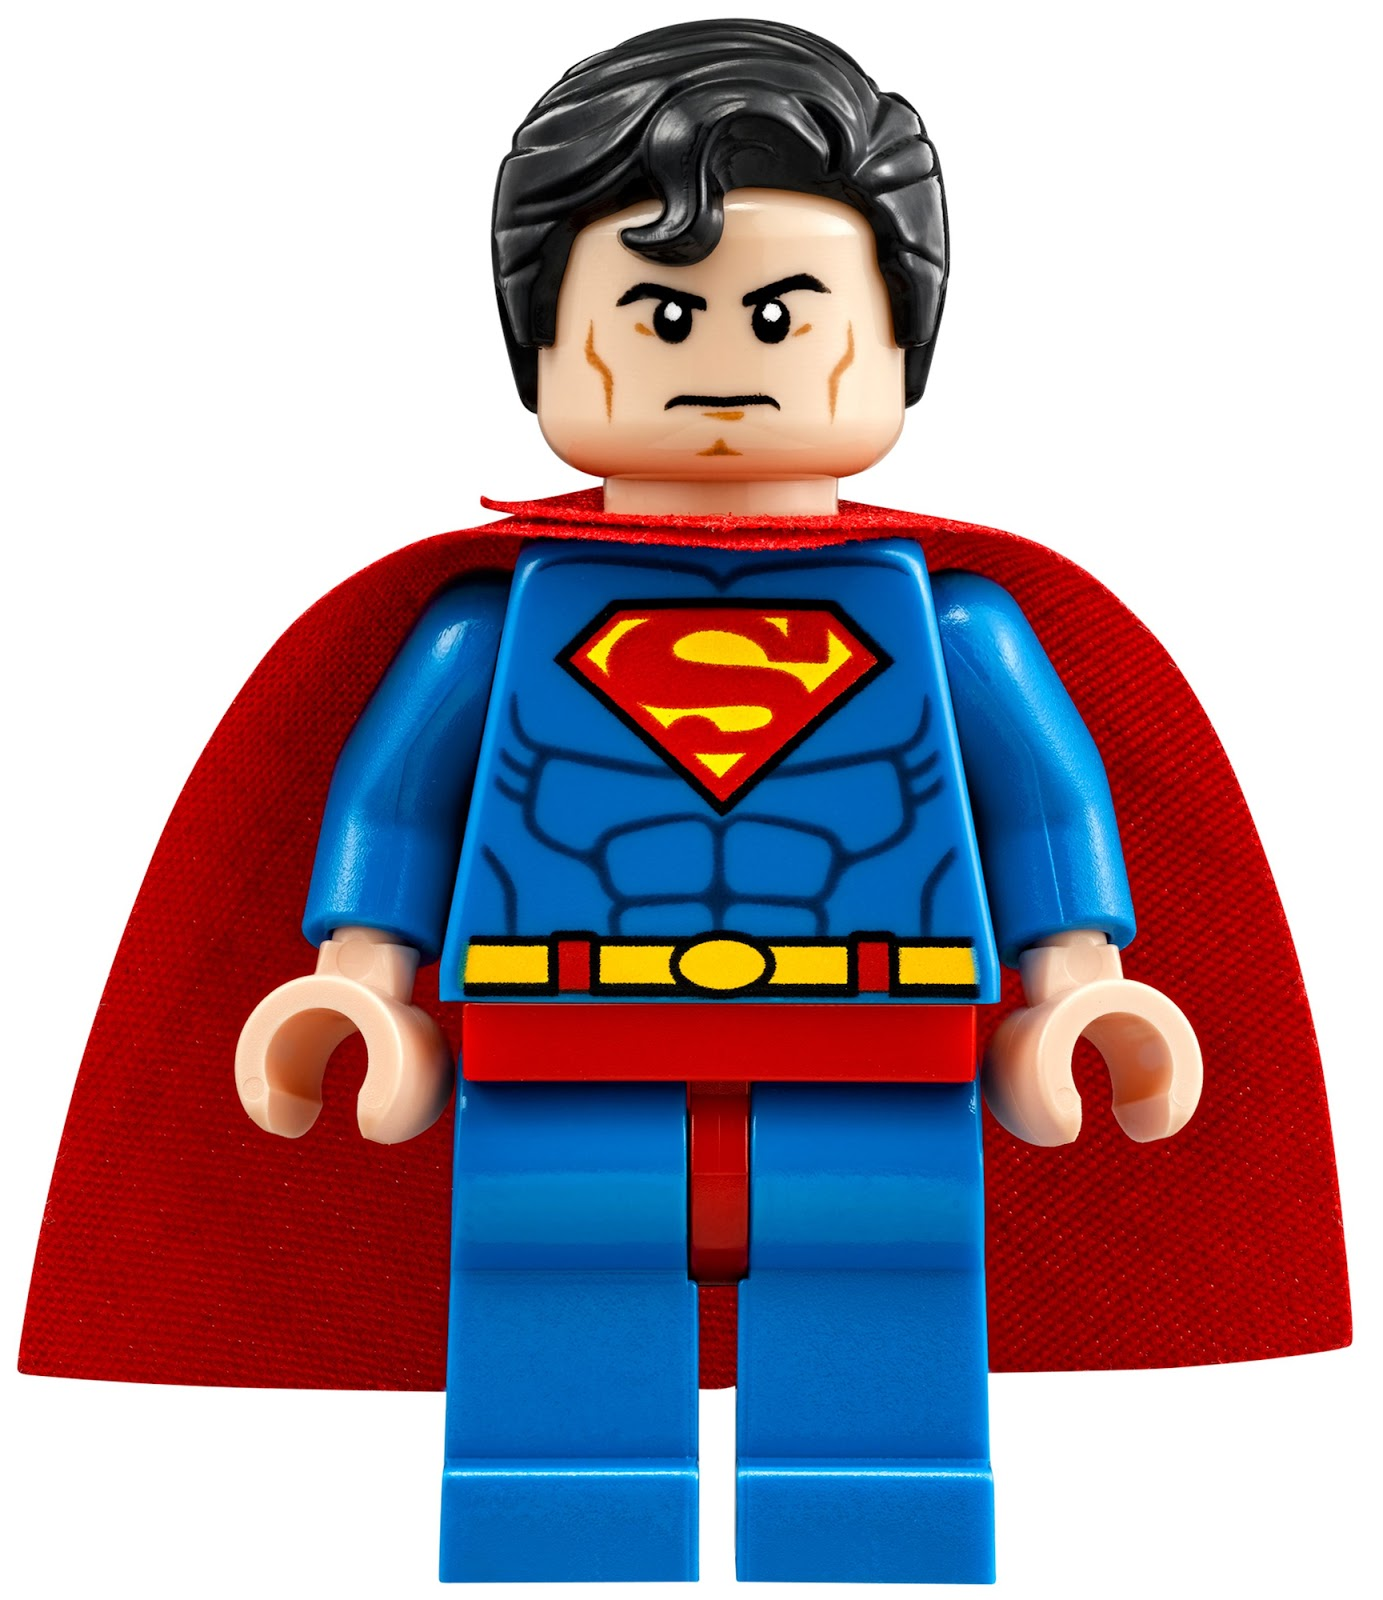 The brickverse theme guide dc comics super heroes 2015 - Logo super heros ...